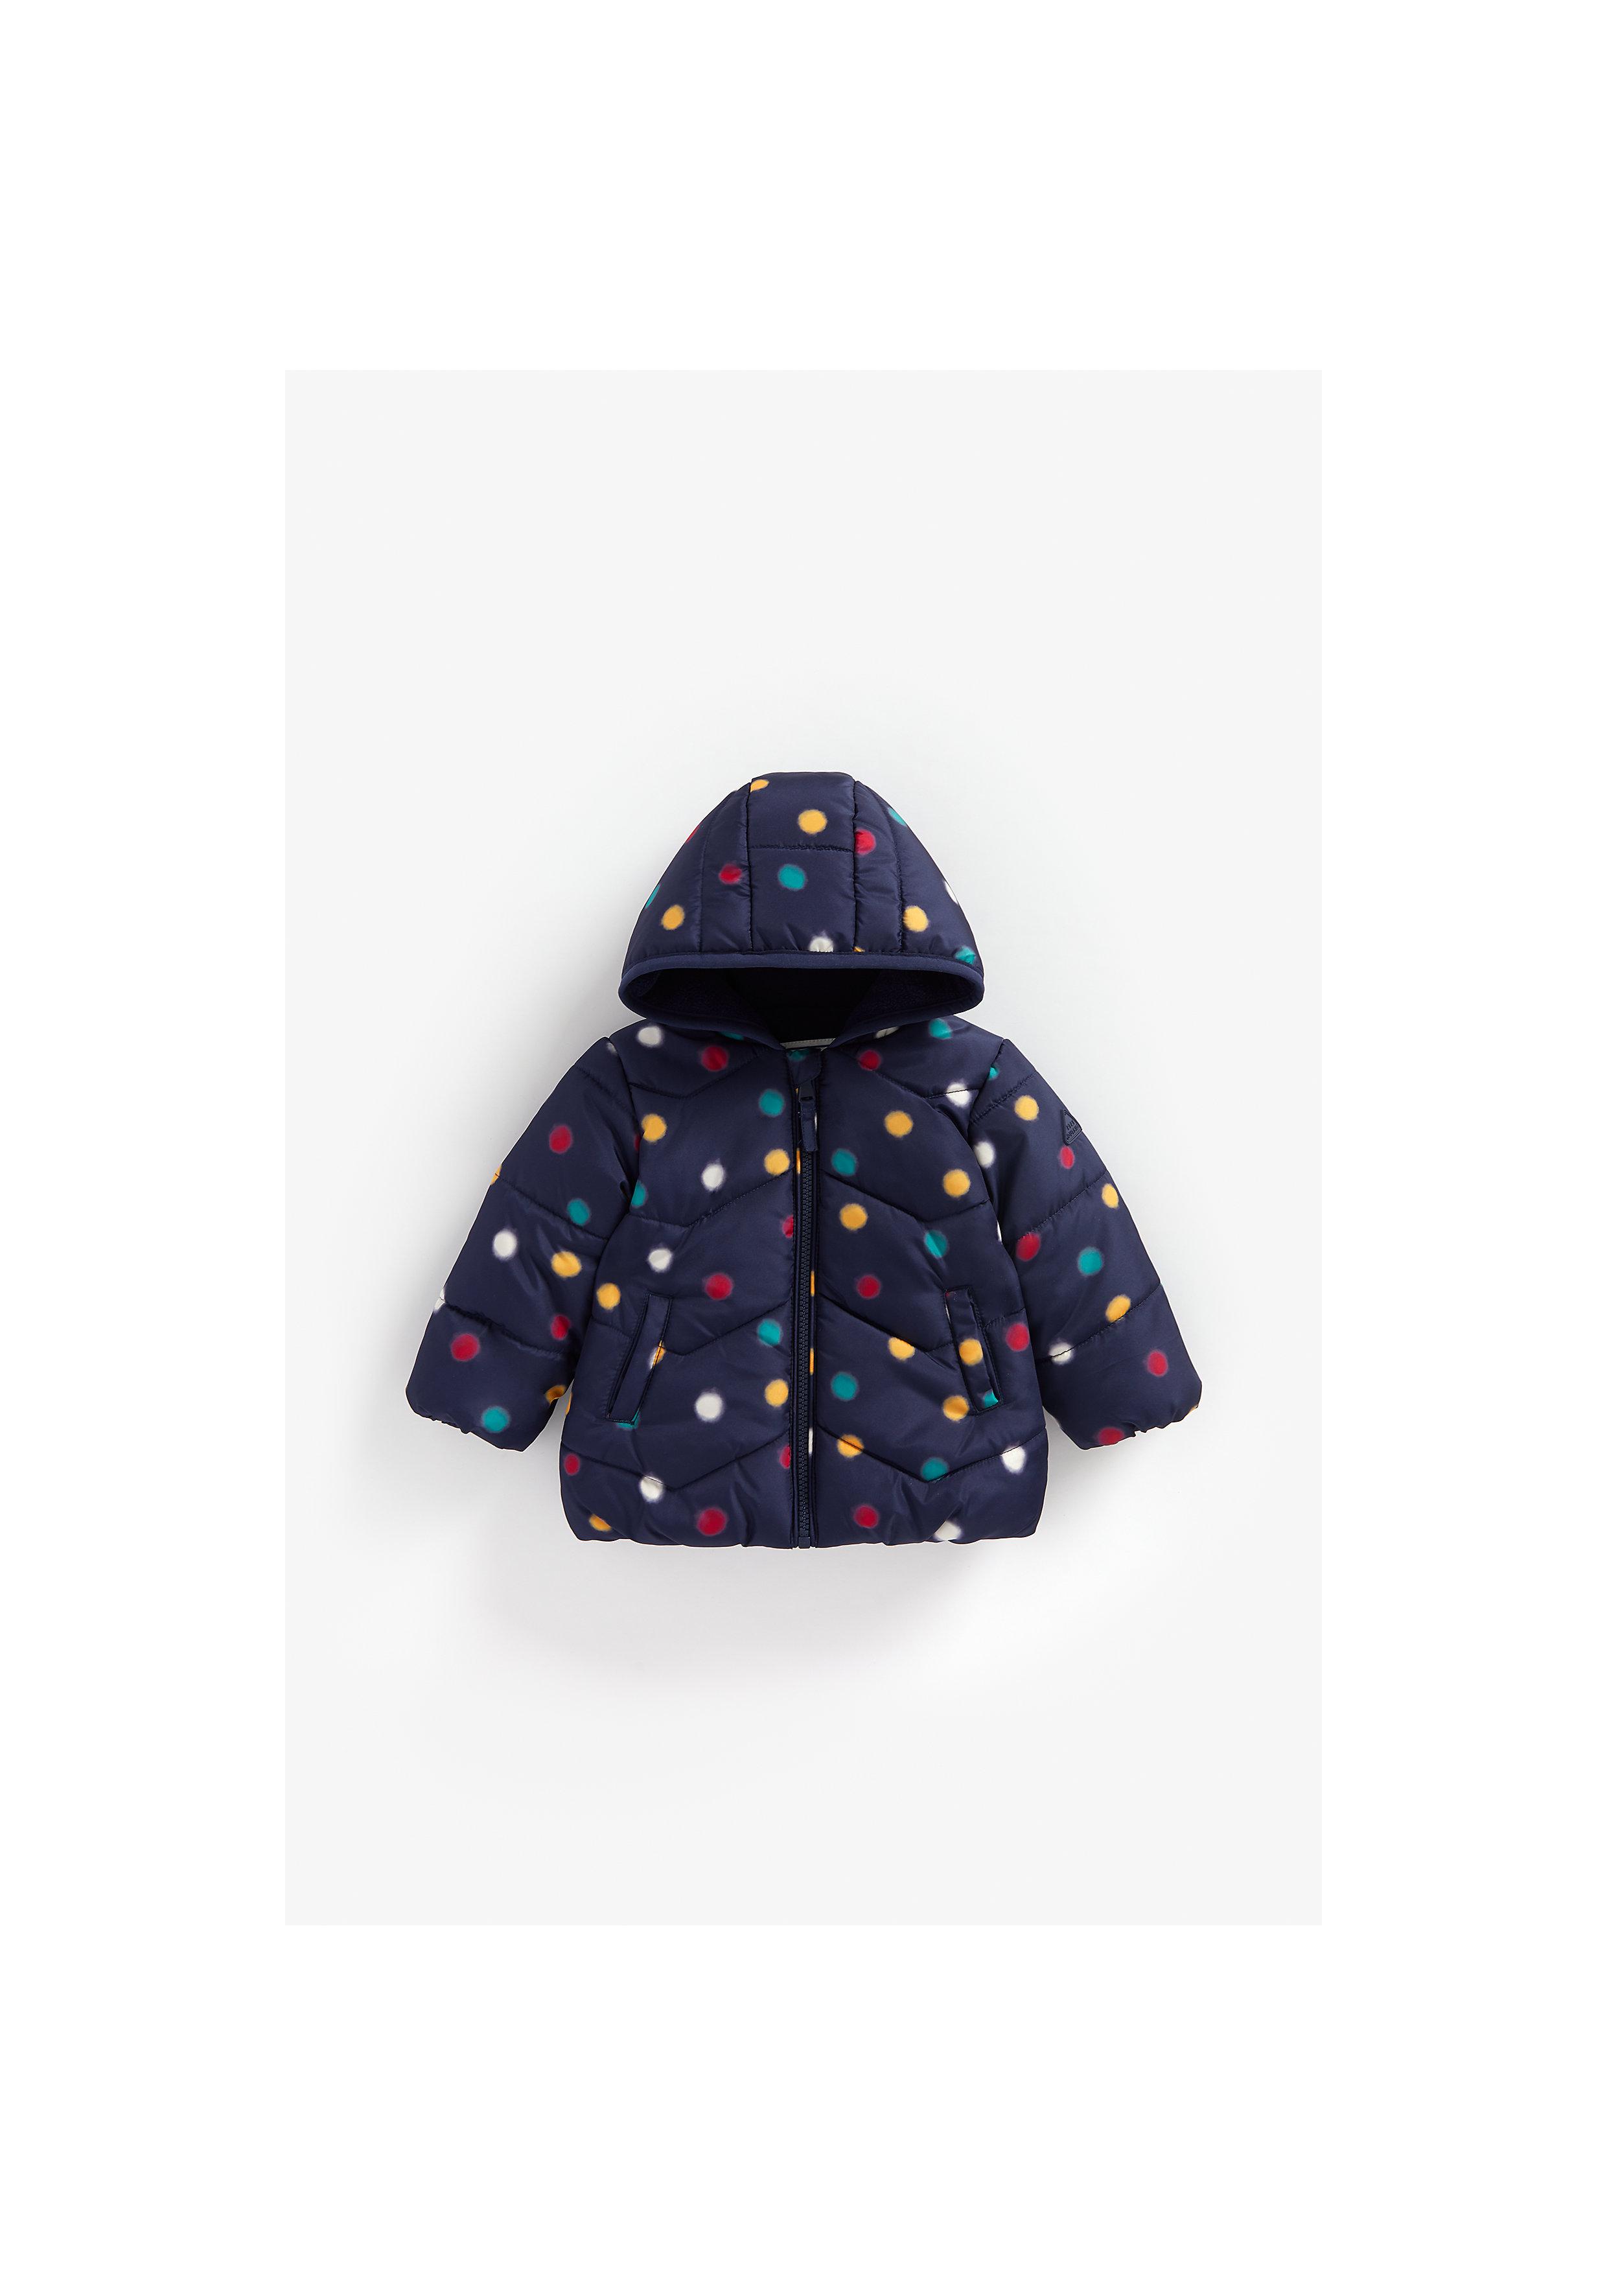 Mothercare | Girls Full Sleeves Jacket Polka Dot Print - Navy